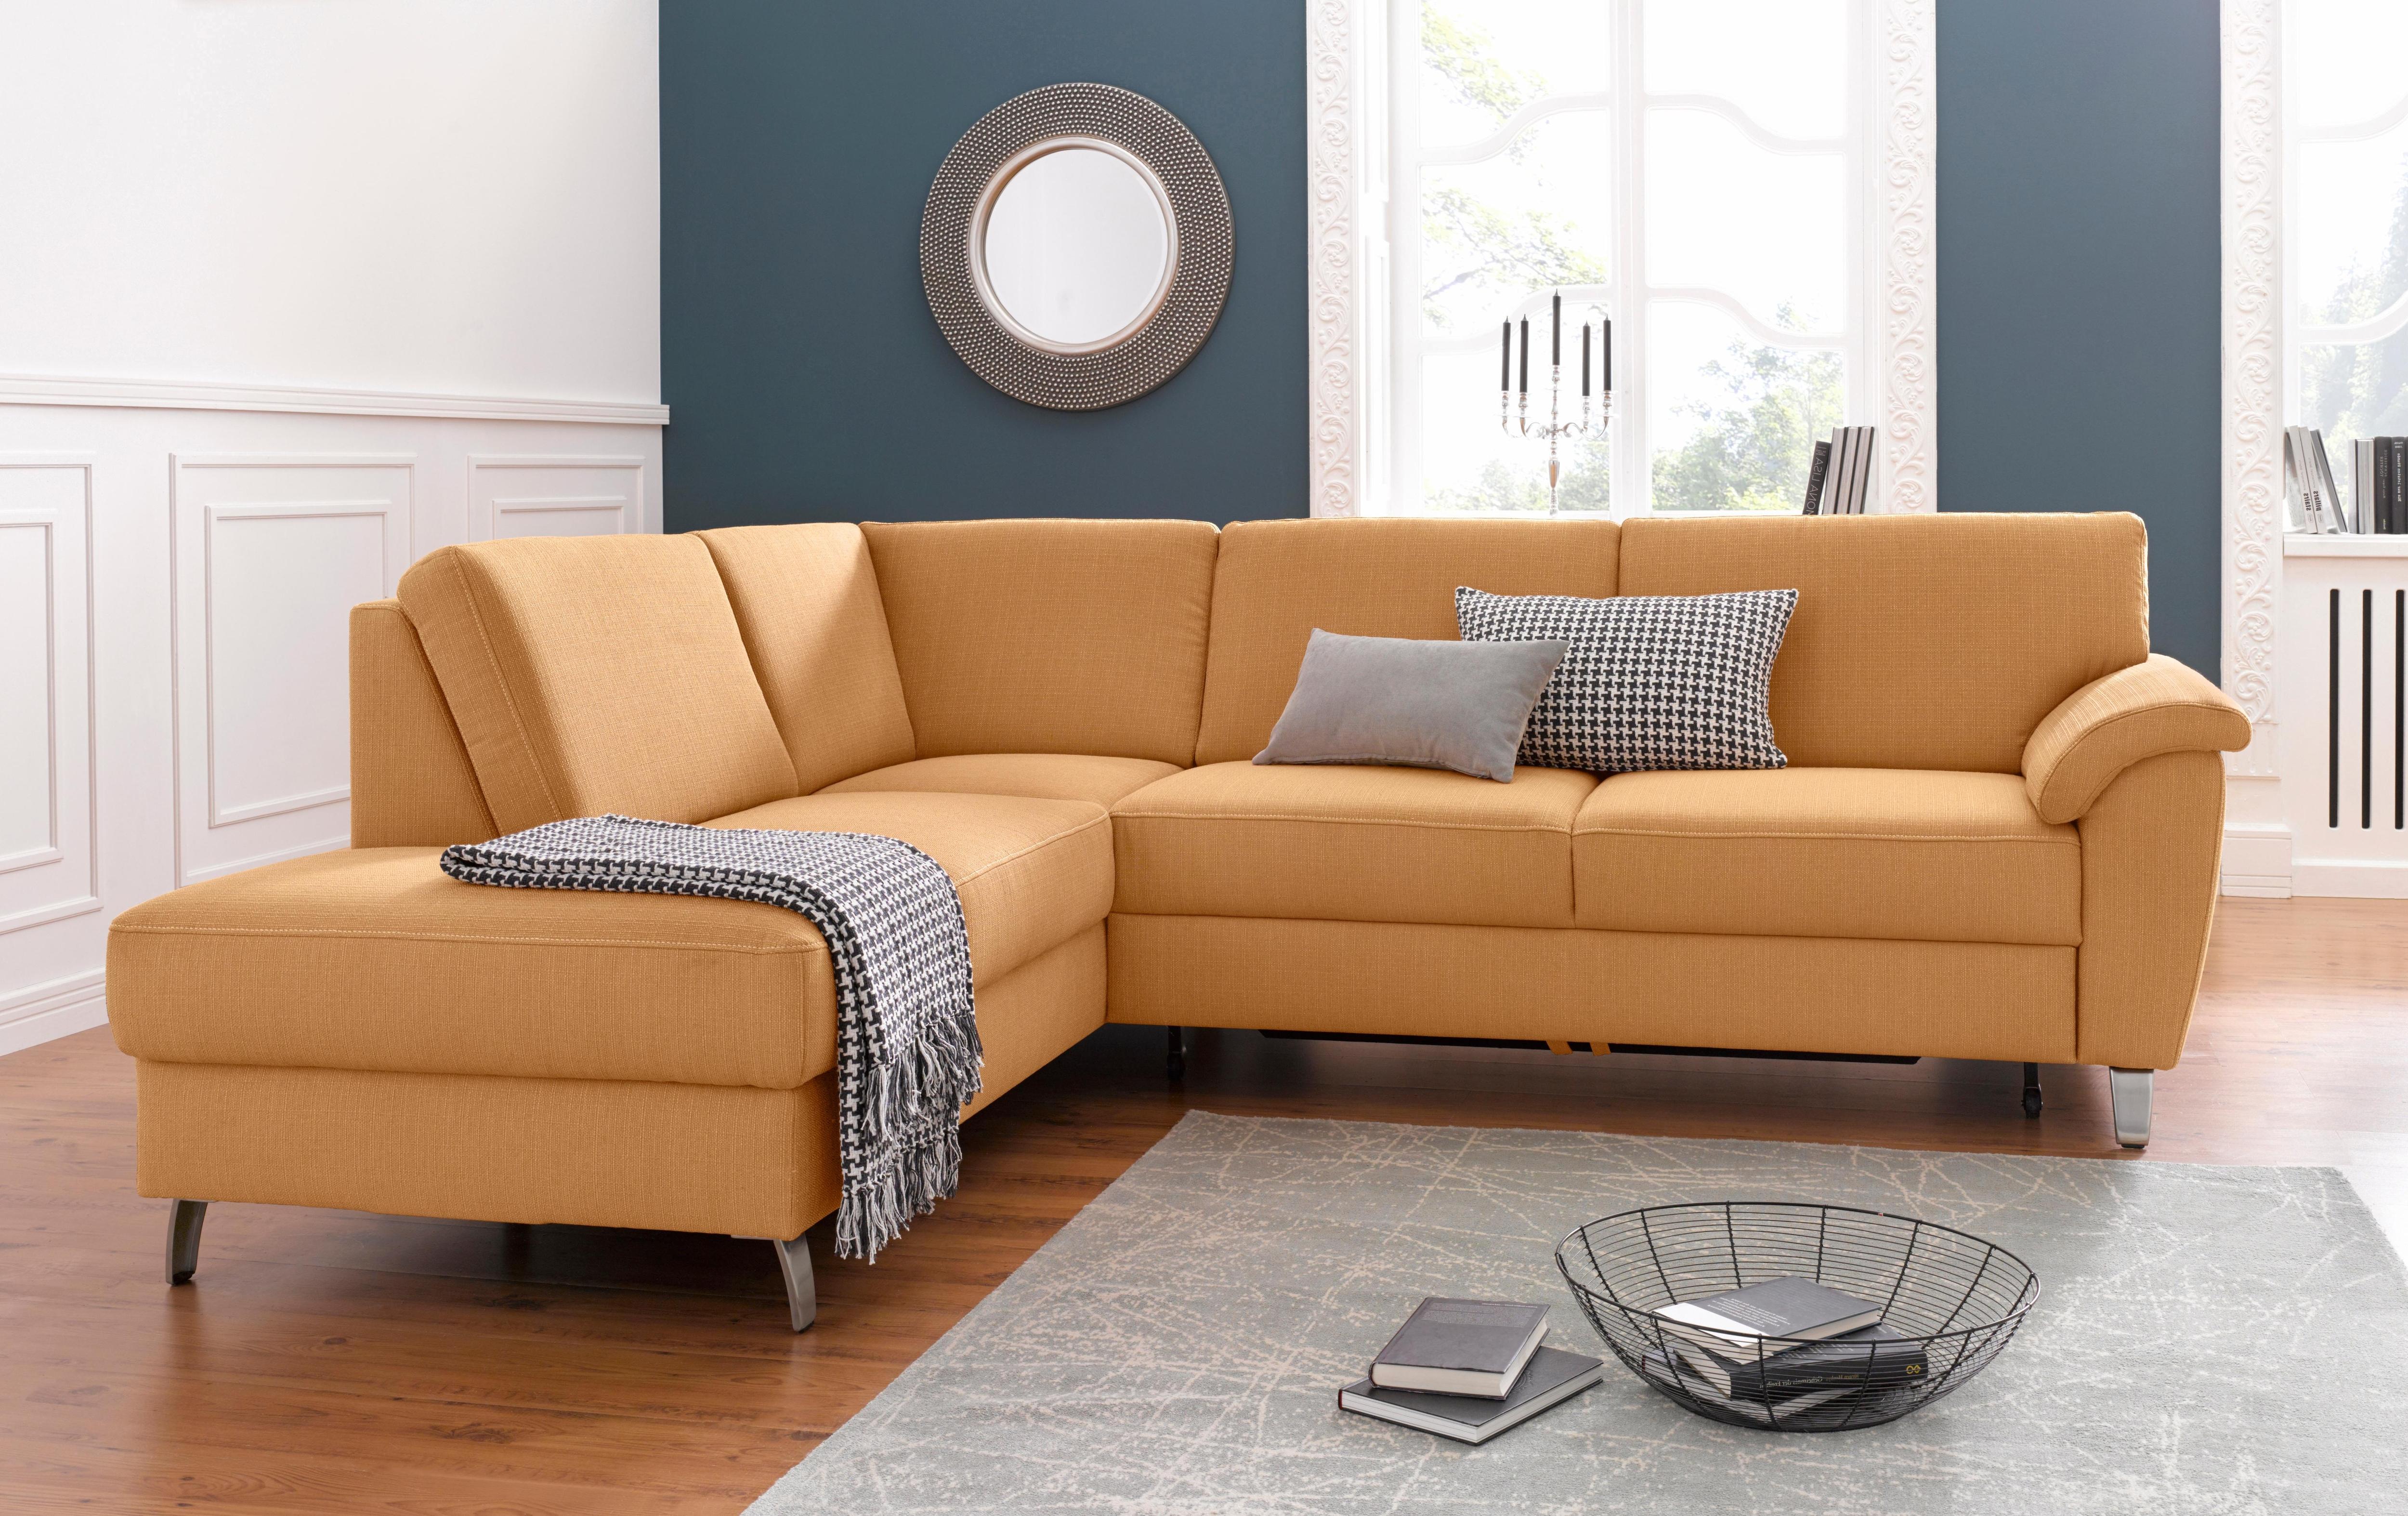 cotta polsterecke wahlweise mit bettfunktion moebel suchmaschine. Black Bedroom Furniture Sets. Home Design Ideas